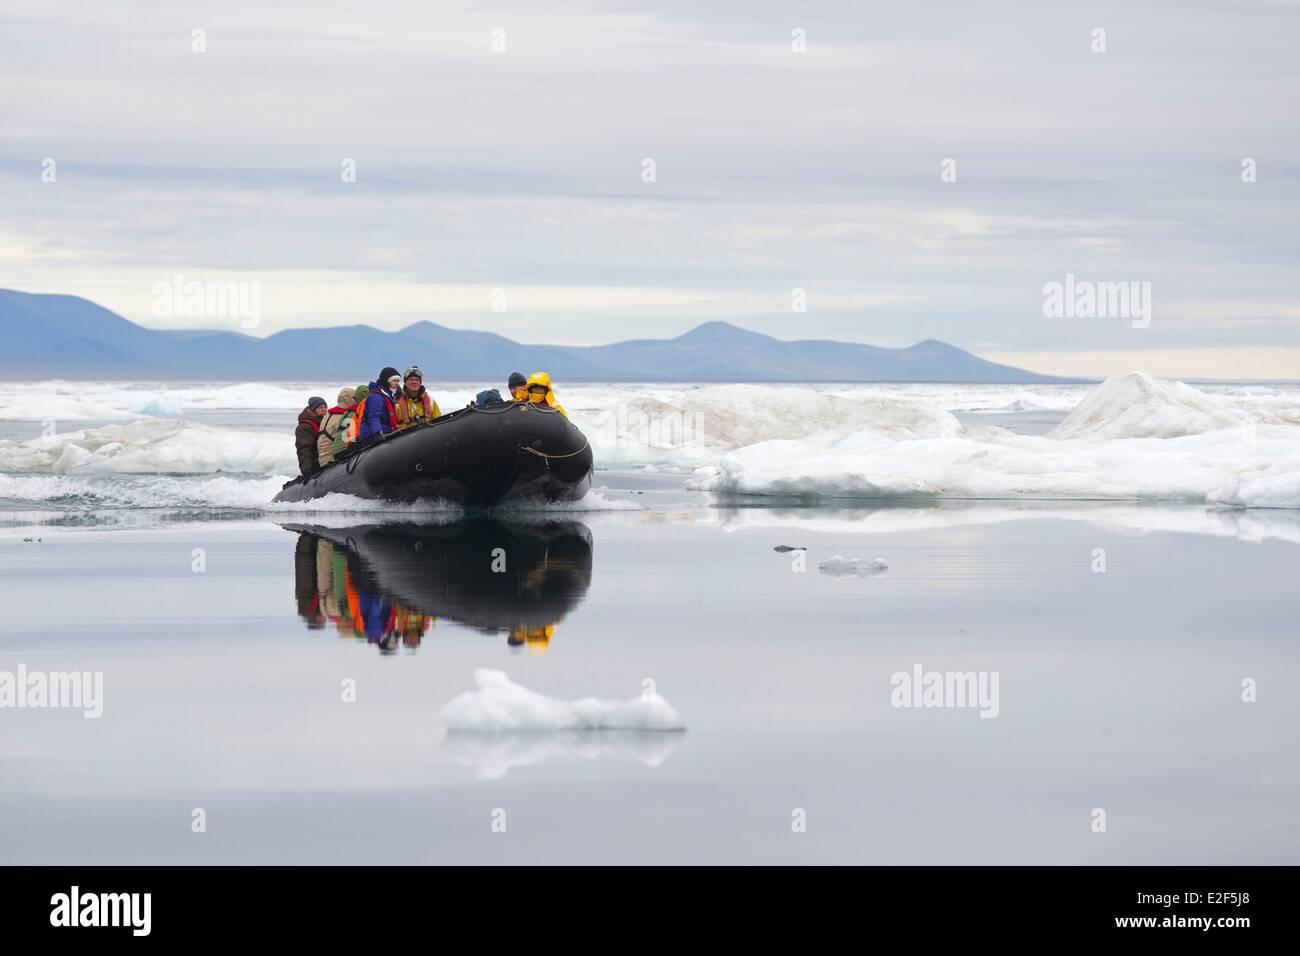 Russia, Chukotka autonomous district, Wrangel island, Pack ice, photographers on board of zodiacs Stock Photo